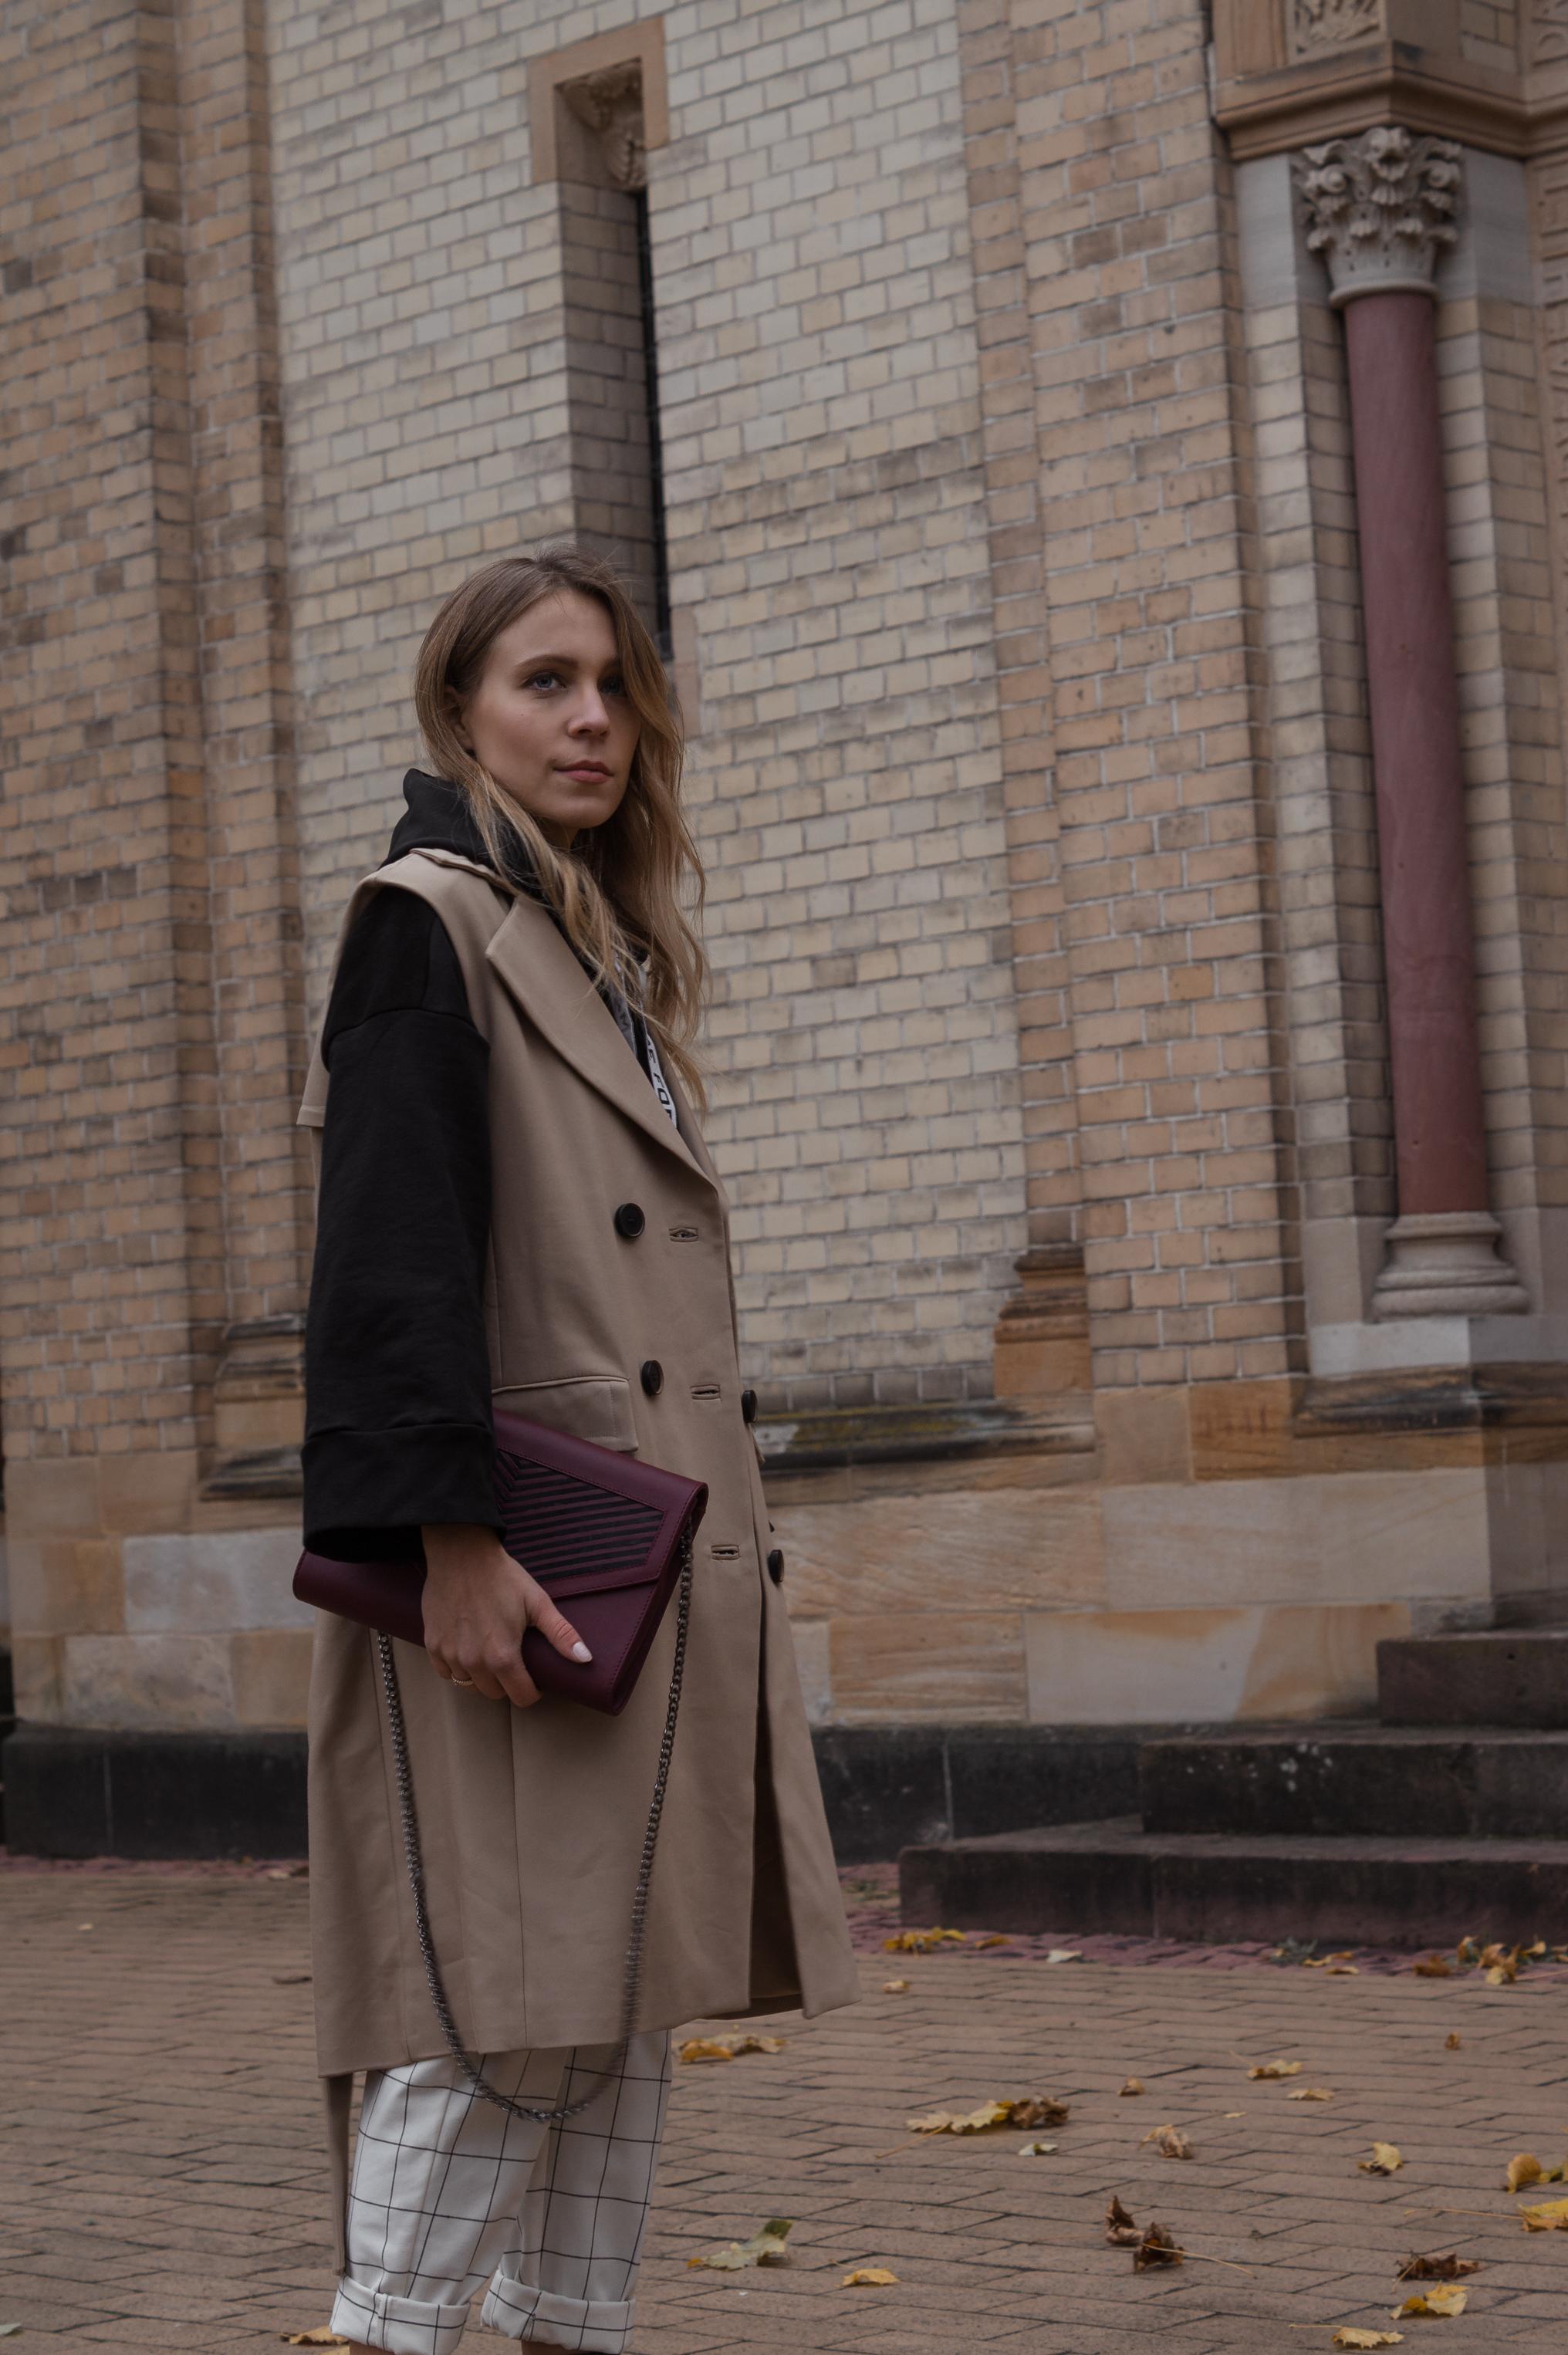 Zara Hoodie Trench Vest Lili Radu Bag Fashionblogger Sariety Modeblog Heidelberg Fall Layers karierte Hose Mango Streetstyle_15